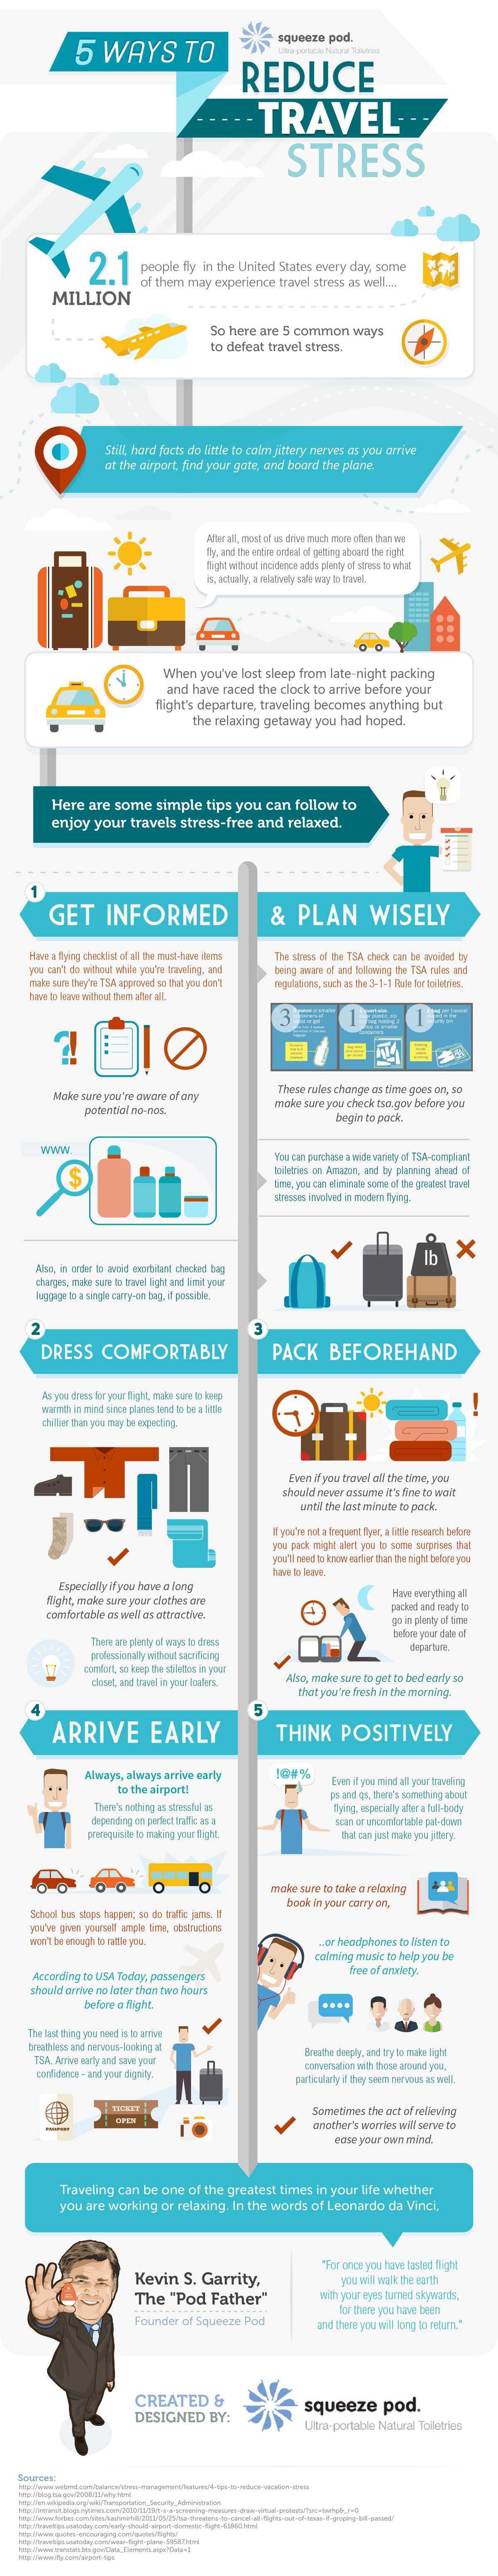 5 Ways To Reduce Travel Stress